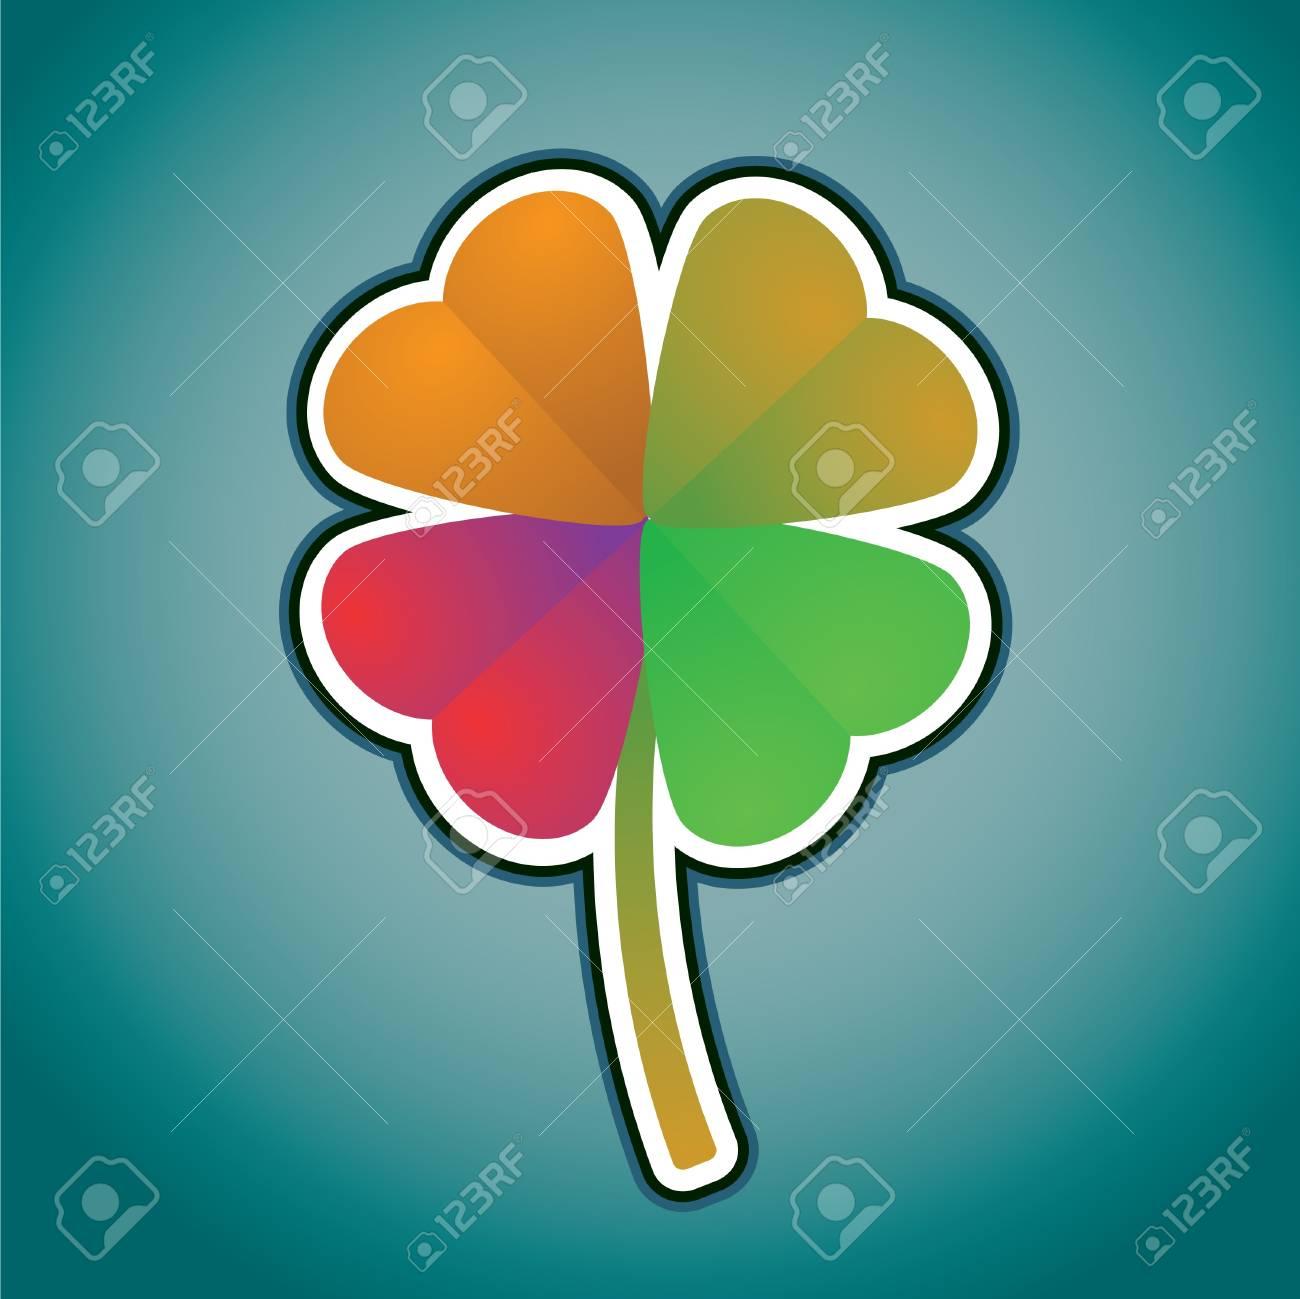 multicolored four-leaf clover - illustration Stock Vector - 13868417